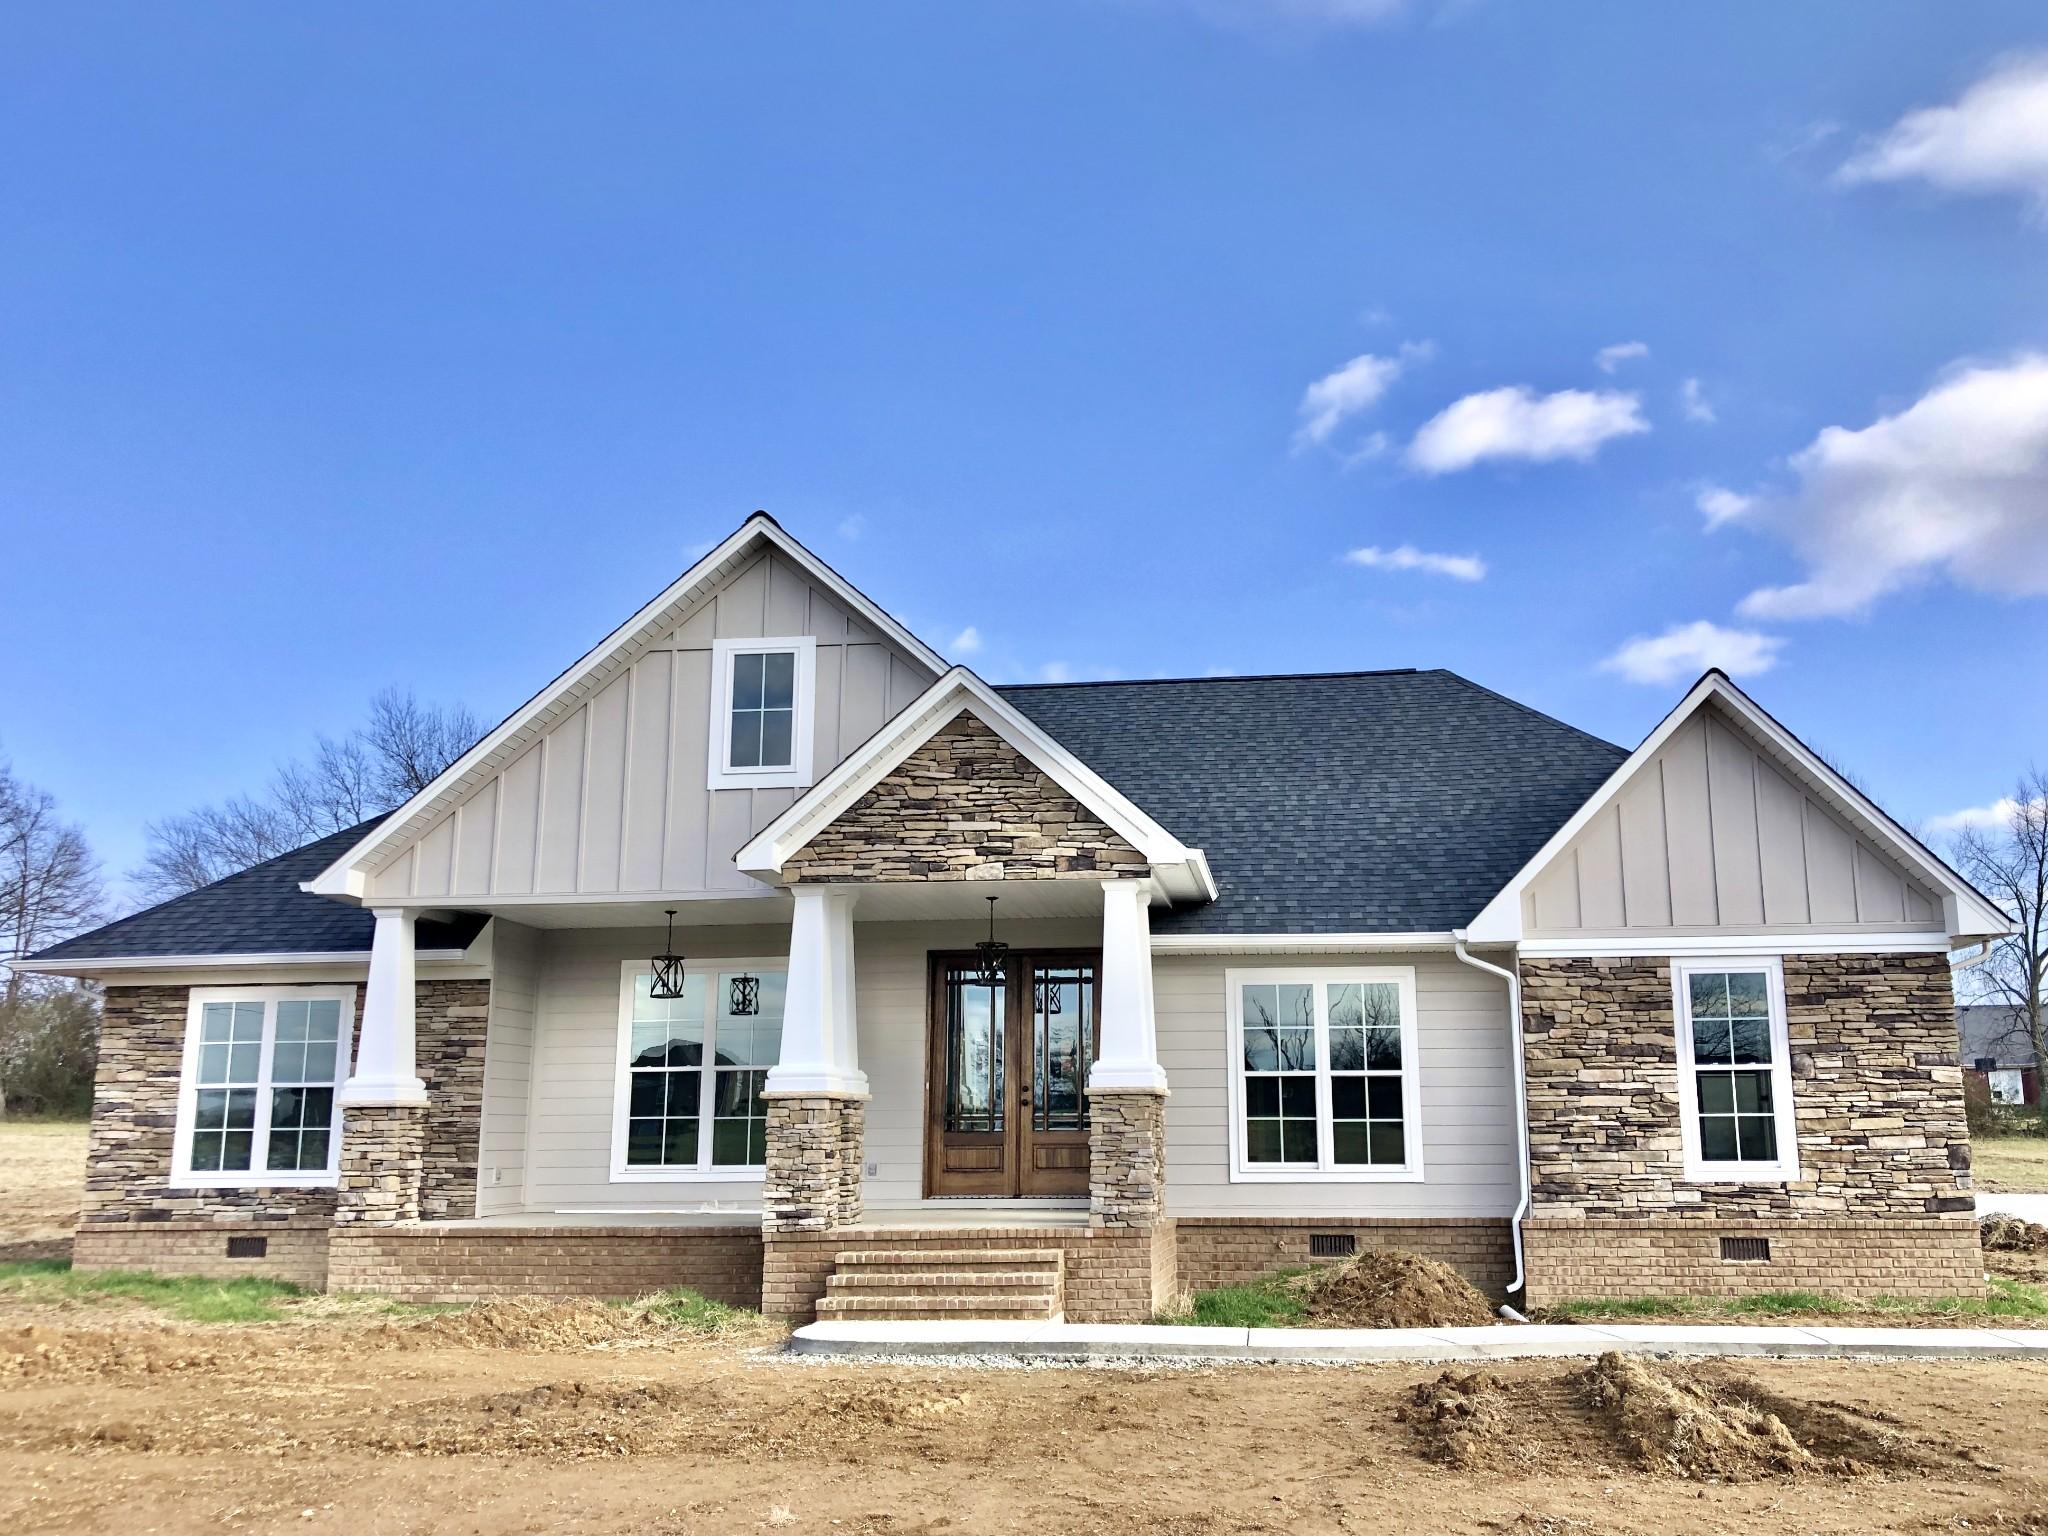 222 New Horizon Circle, Ethridge, TN 38456 - Ethridge, TN real estate listing